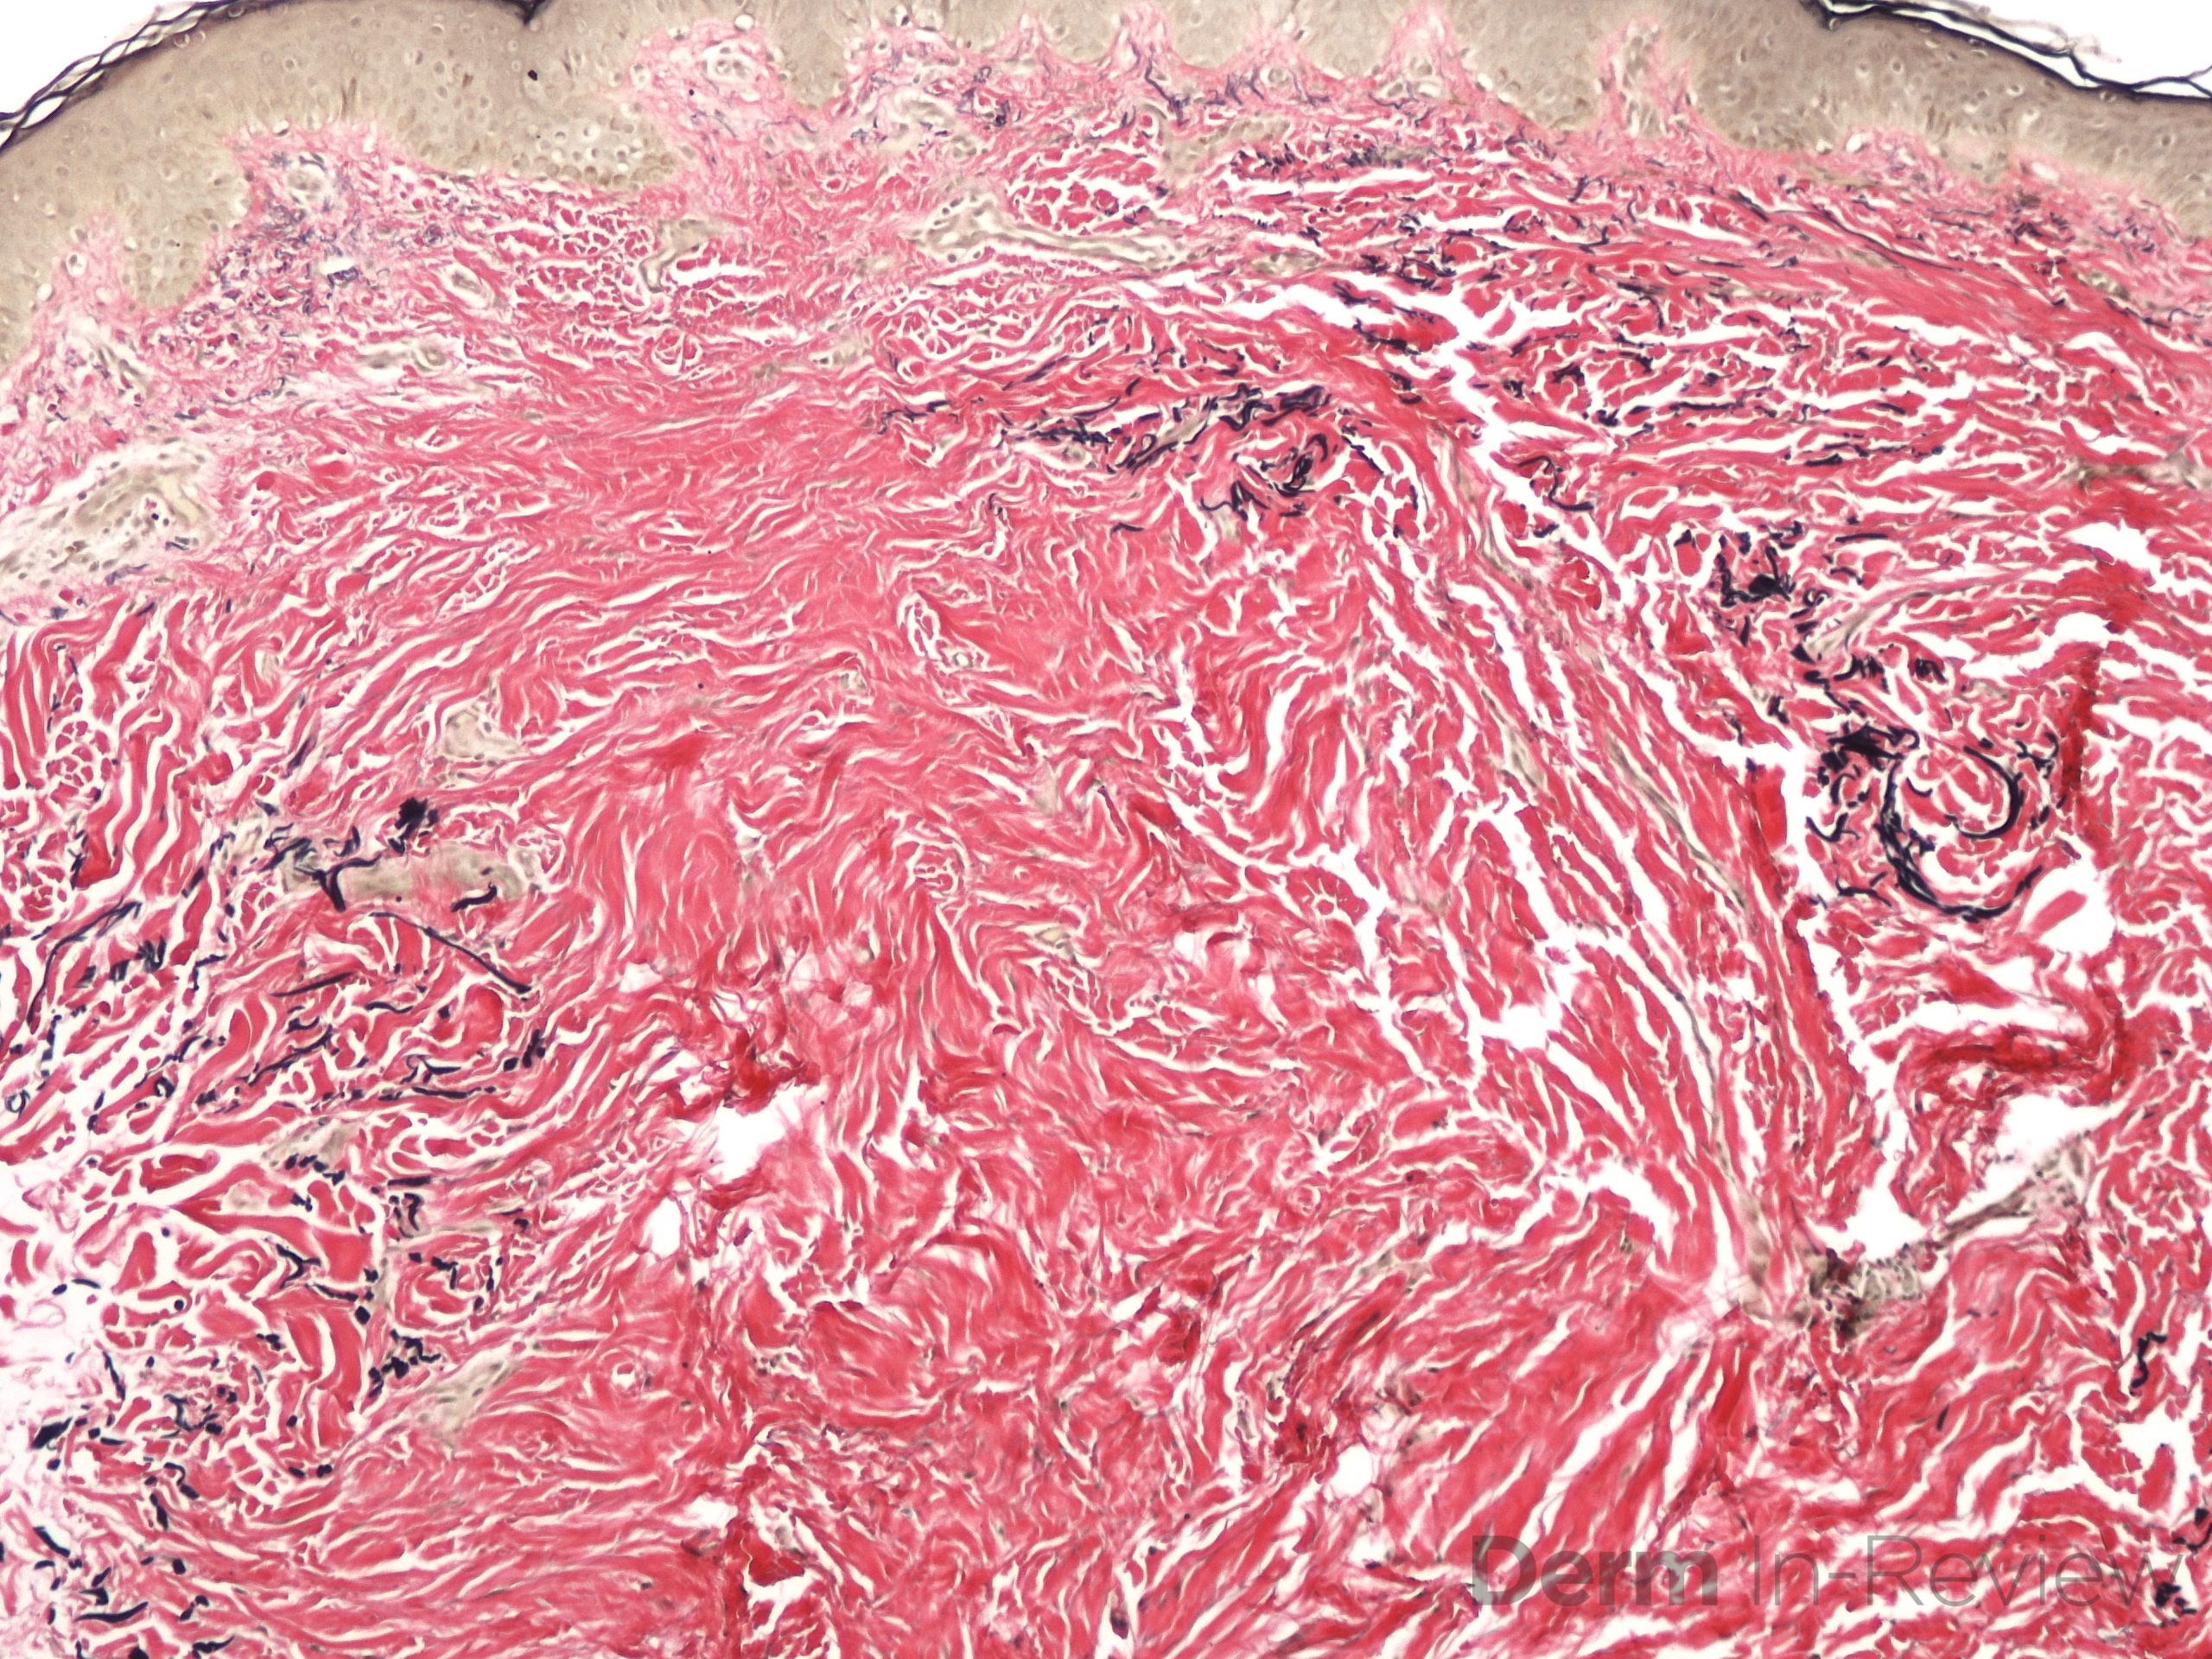 9.12 Anetoderma, elastic stain